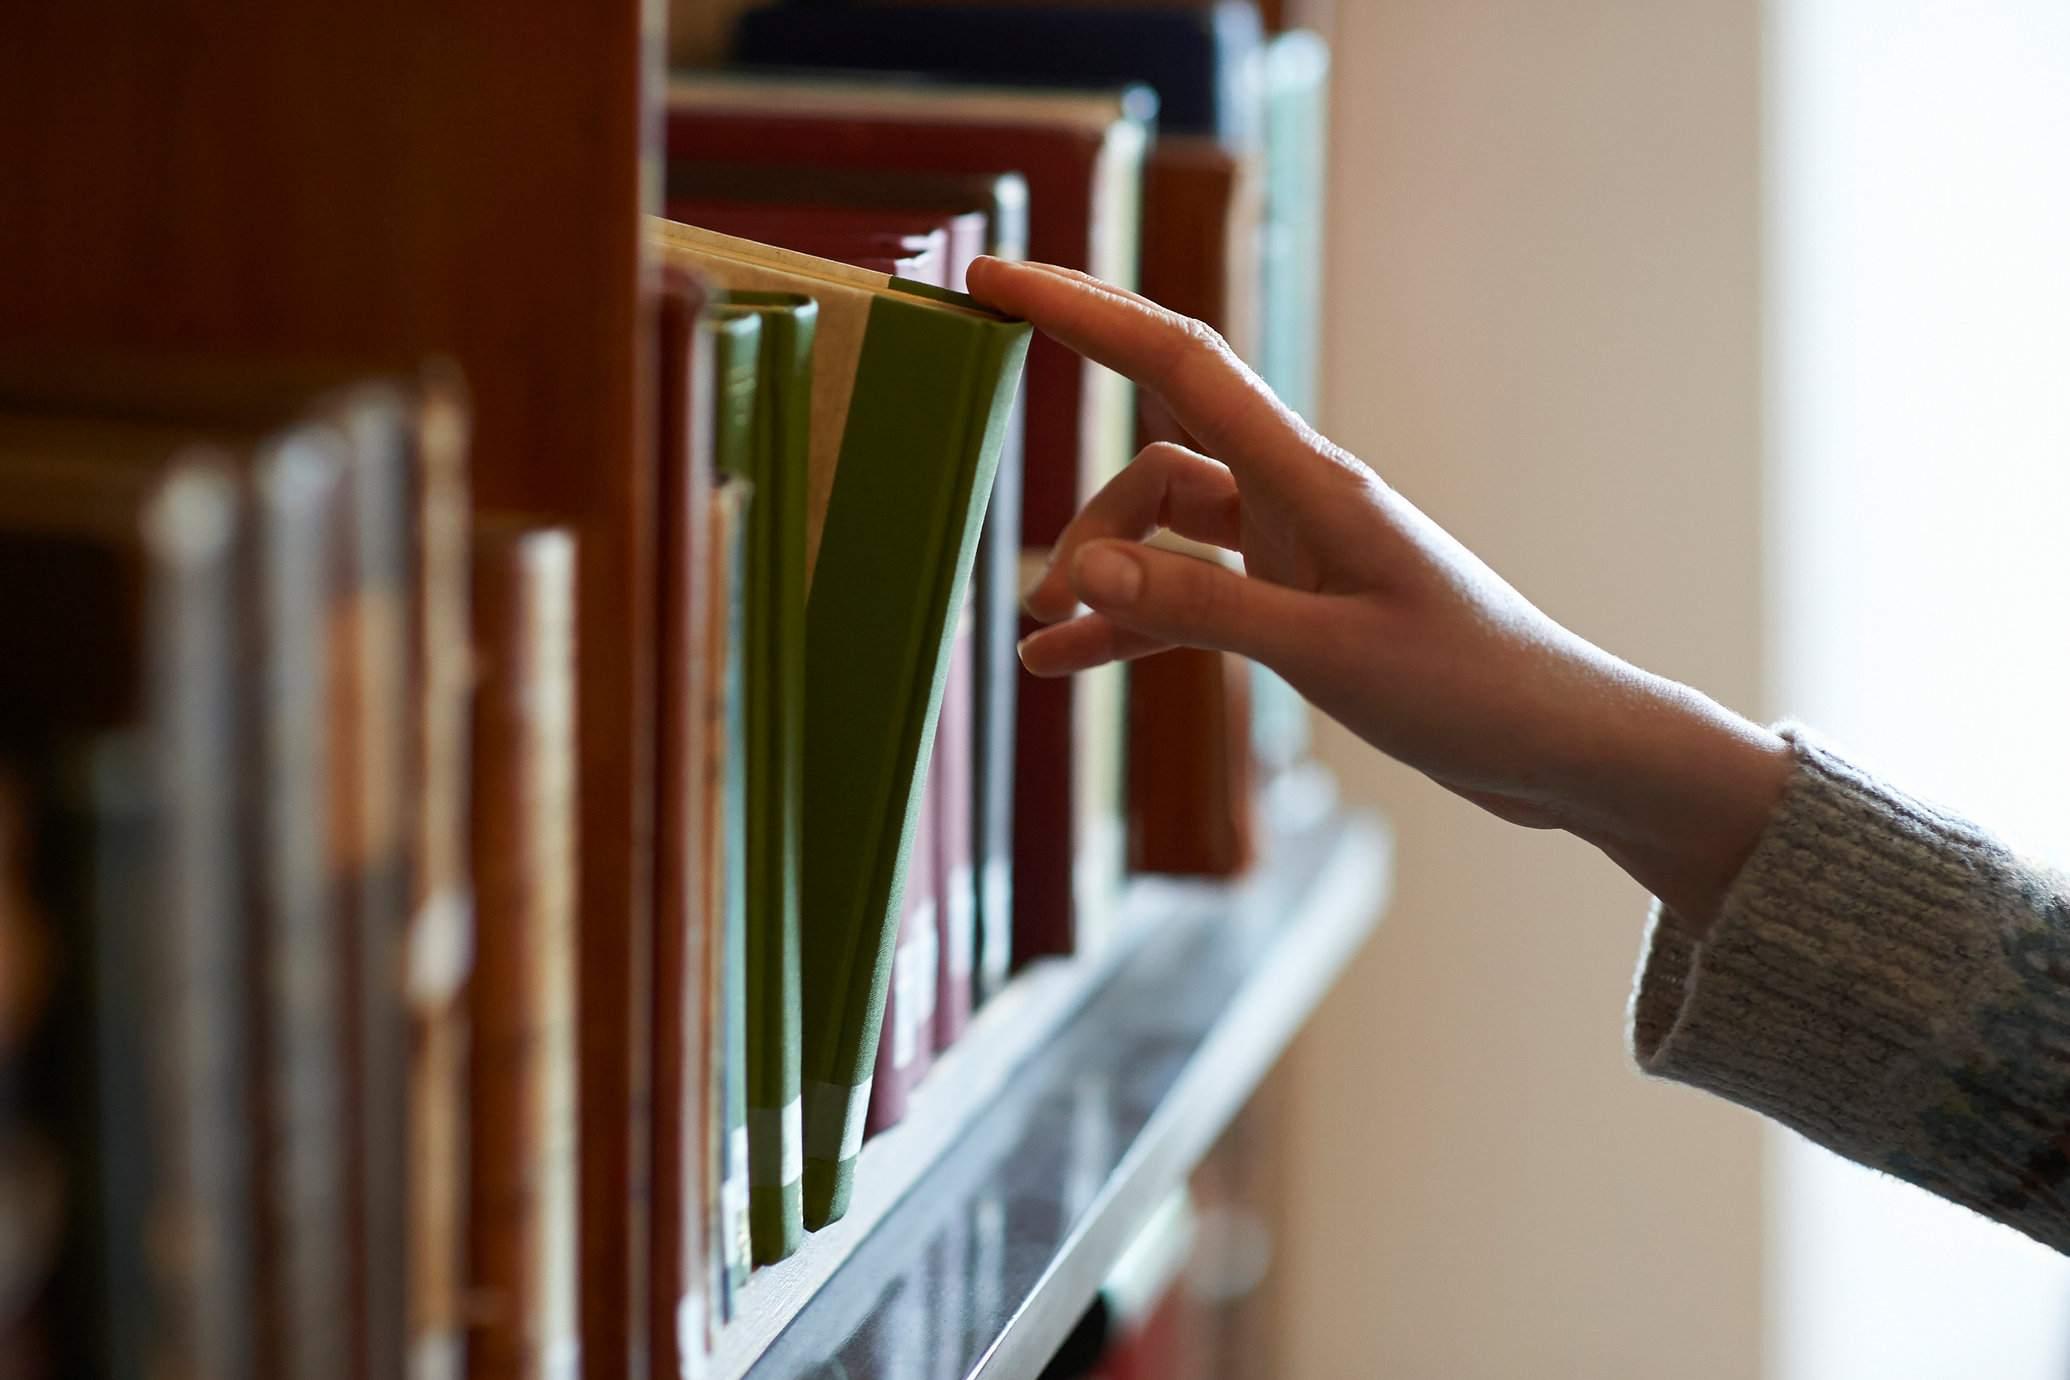 A hand picking a book on a book shelf